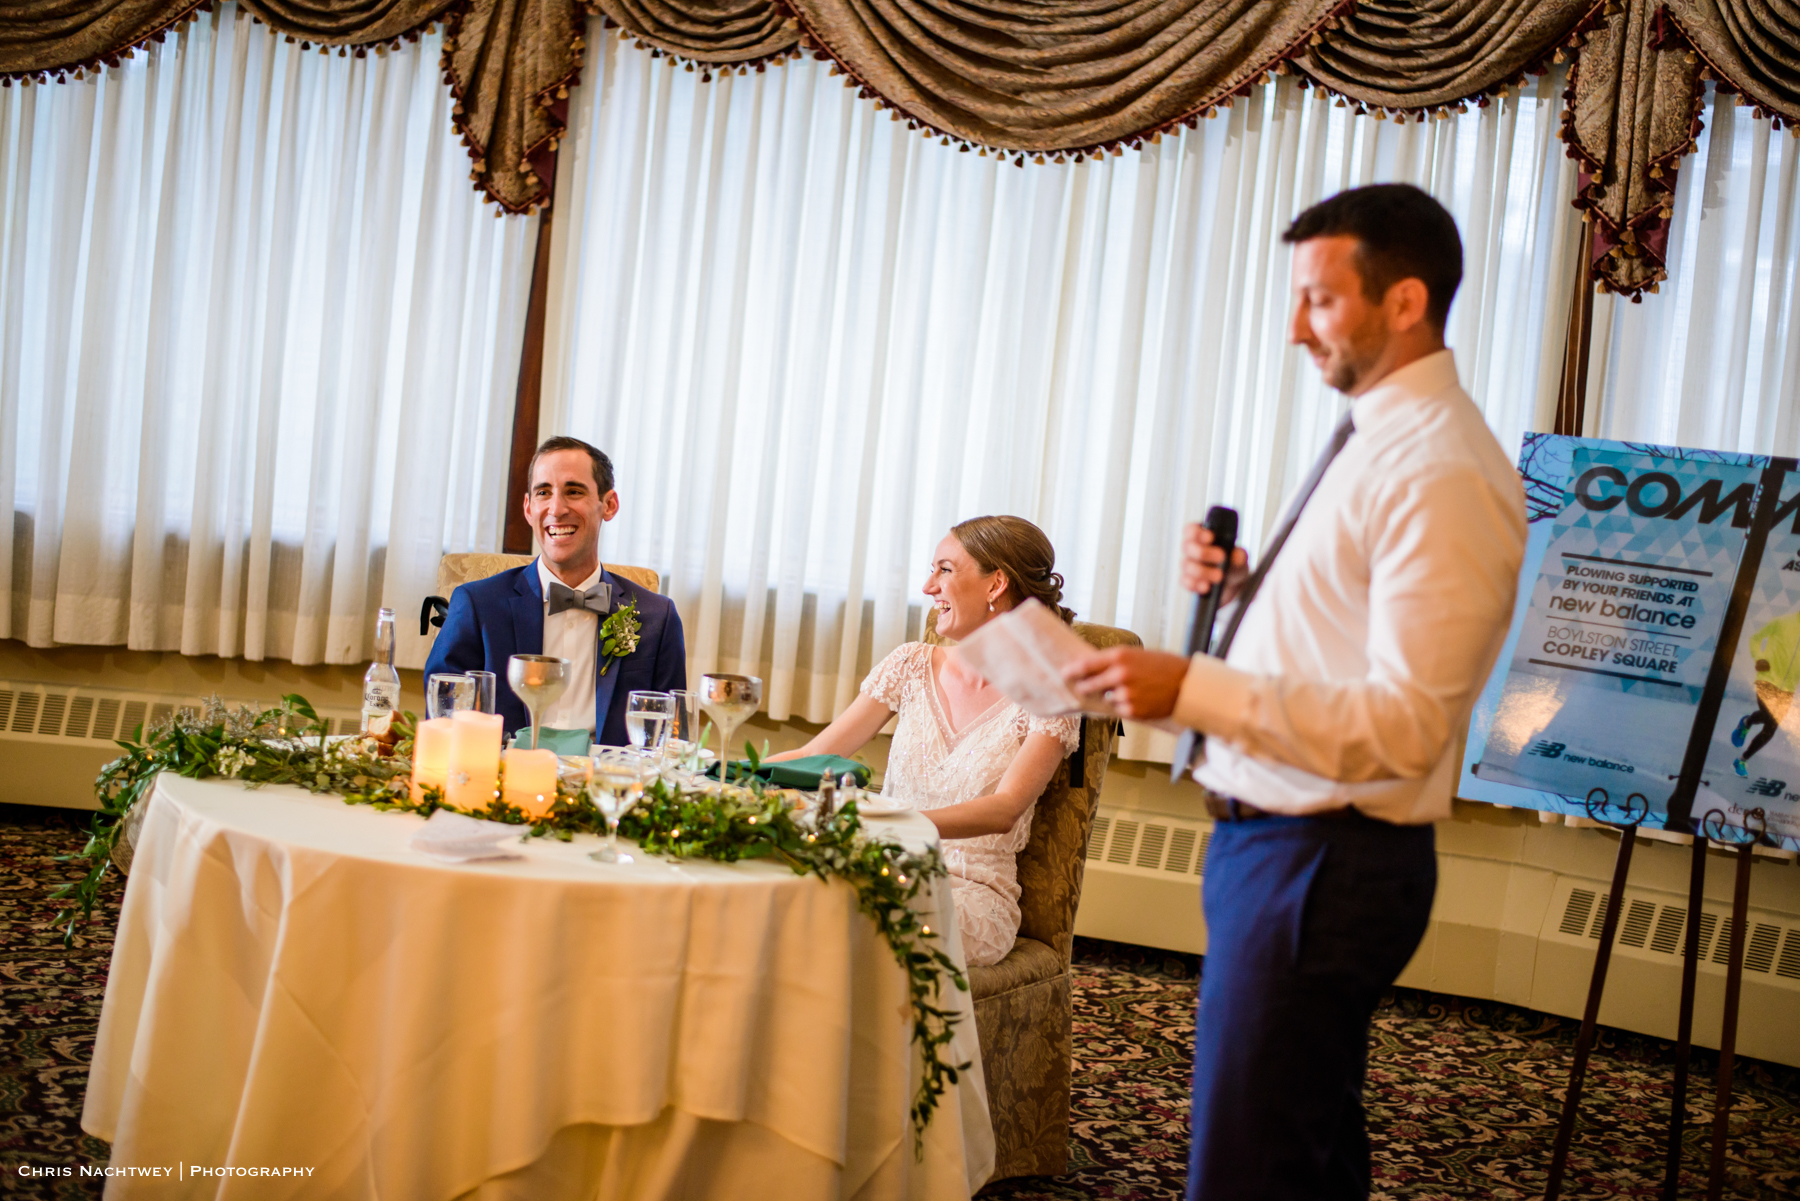 photos-wedding-quidnessett-country-club-ri-chris-nachtwey-photography-2018-51.jpg